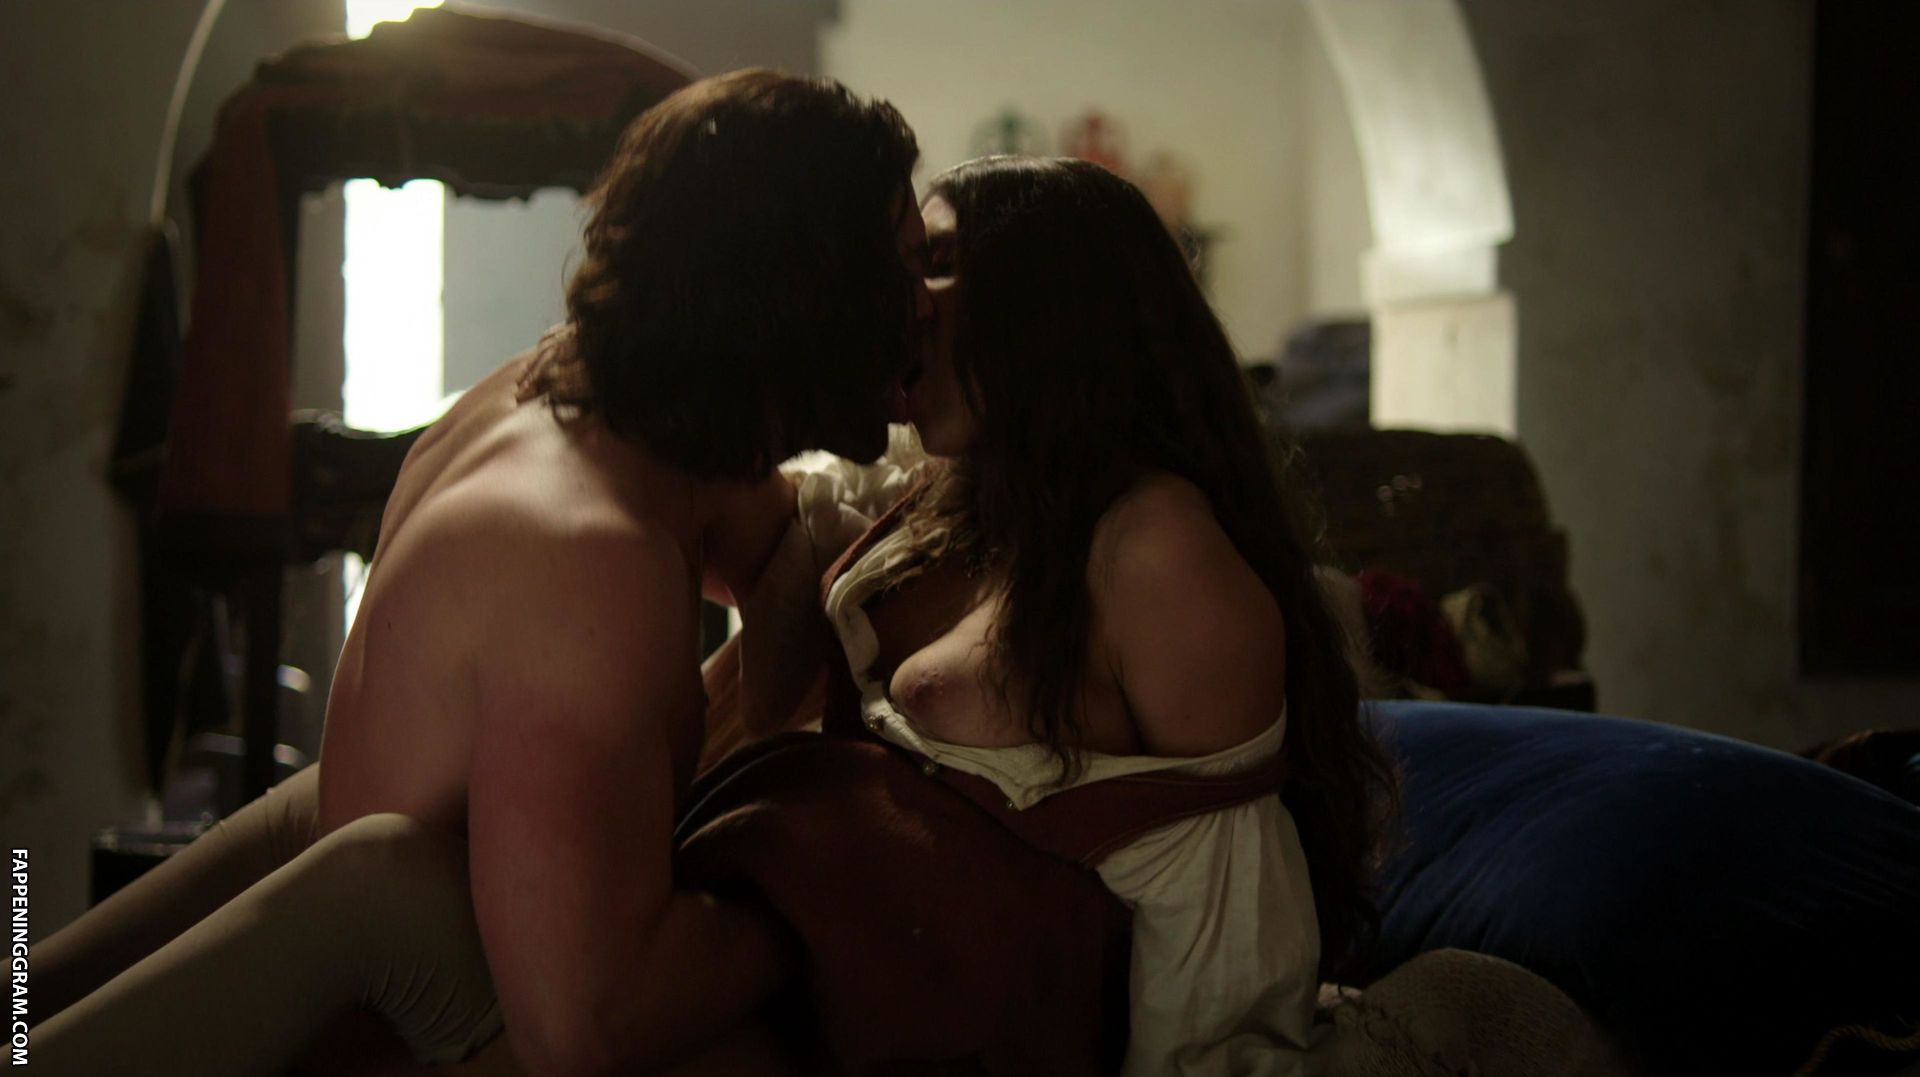 Maria nude anna sturm Nudity in